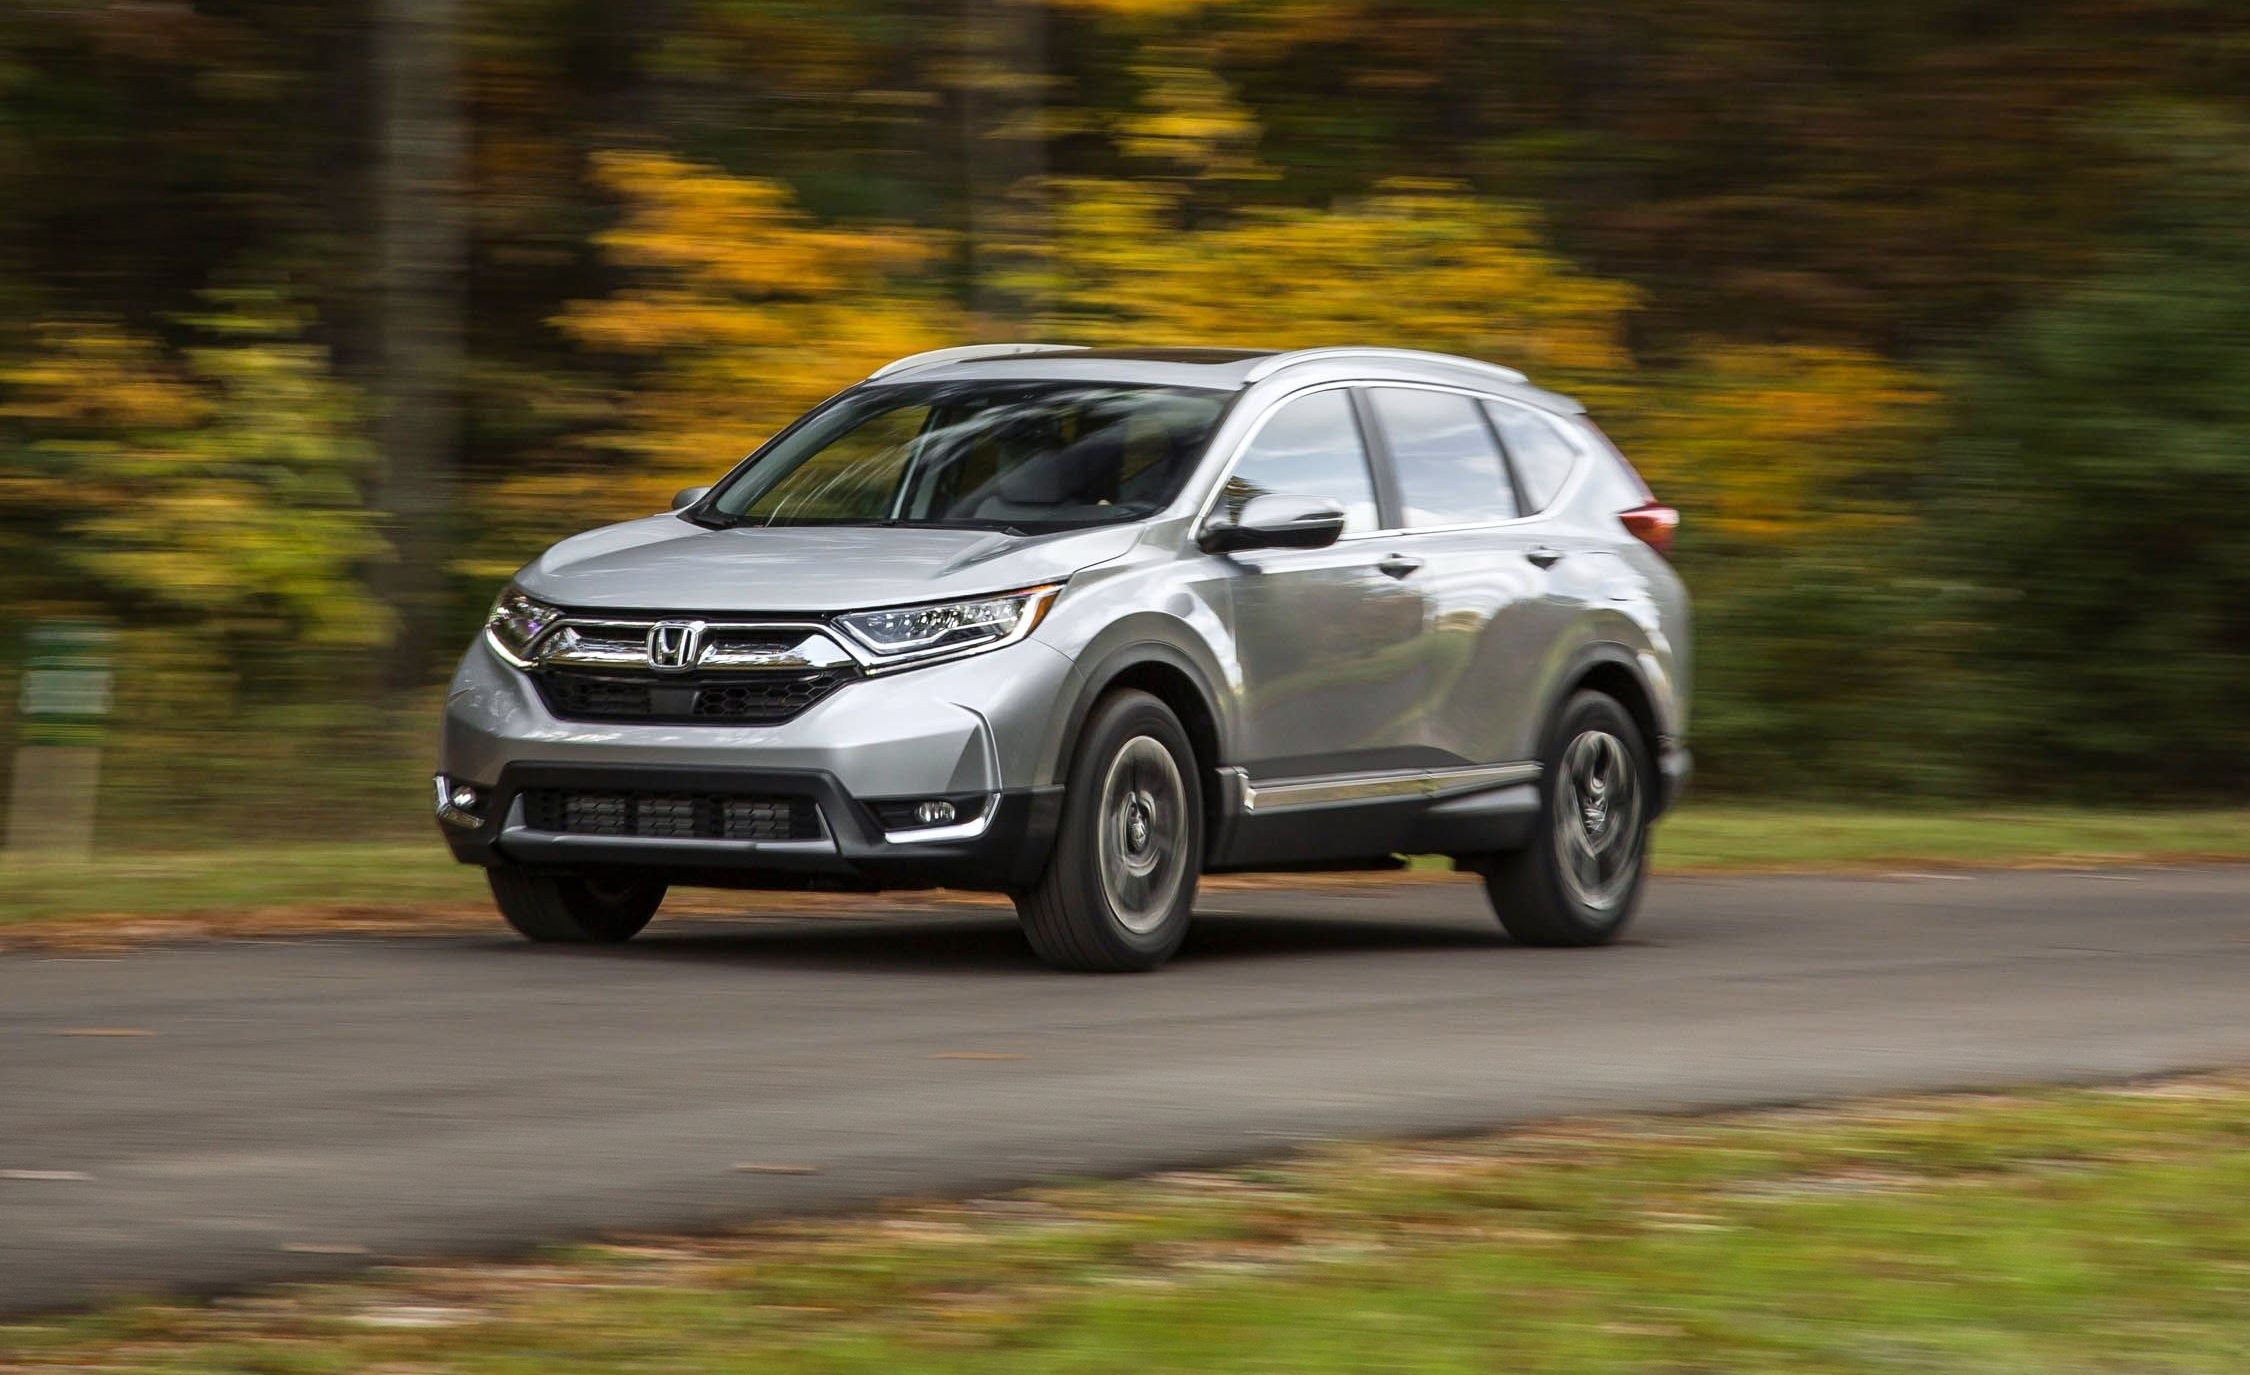 2019 Honda CRV Reviews Car Best compact suv, Best